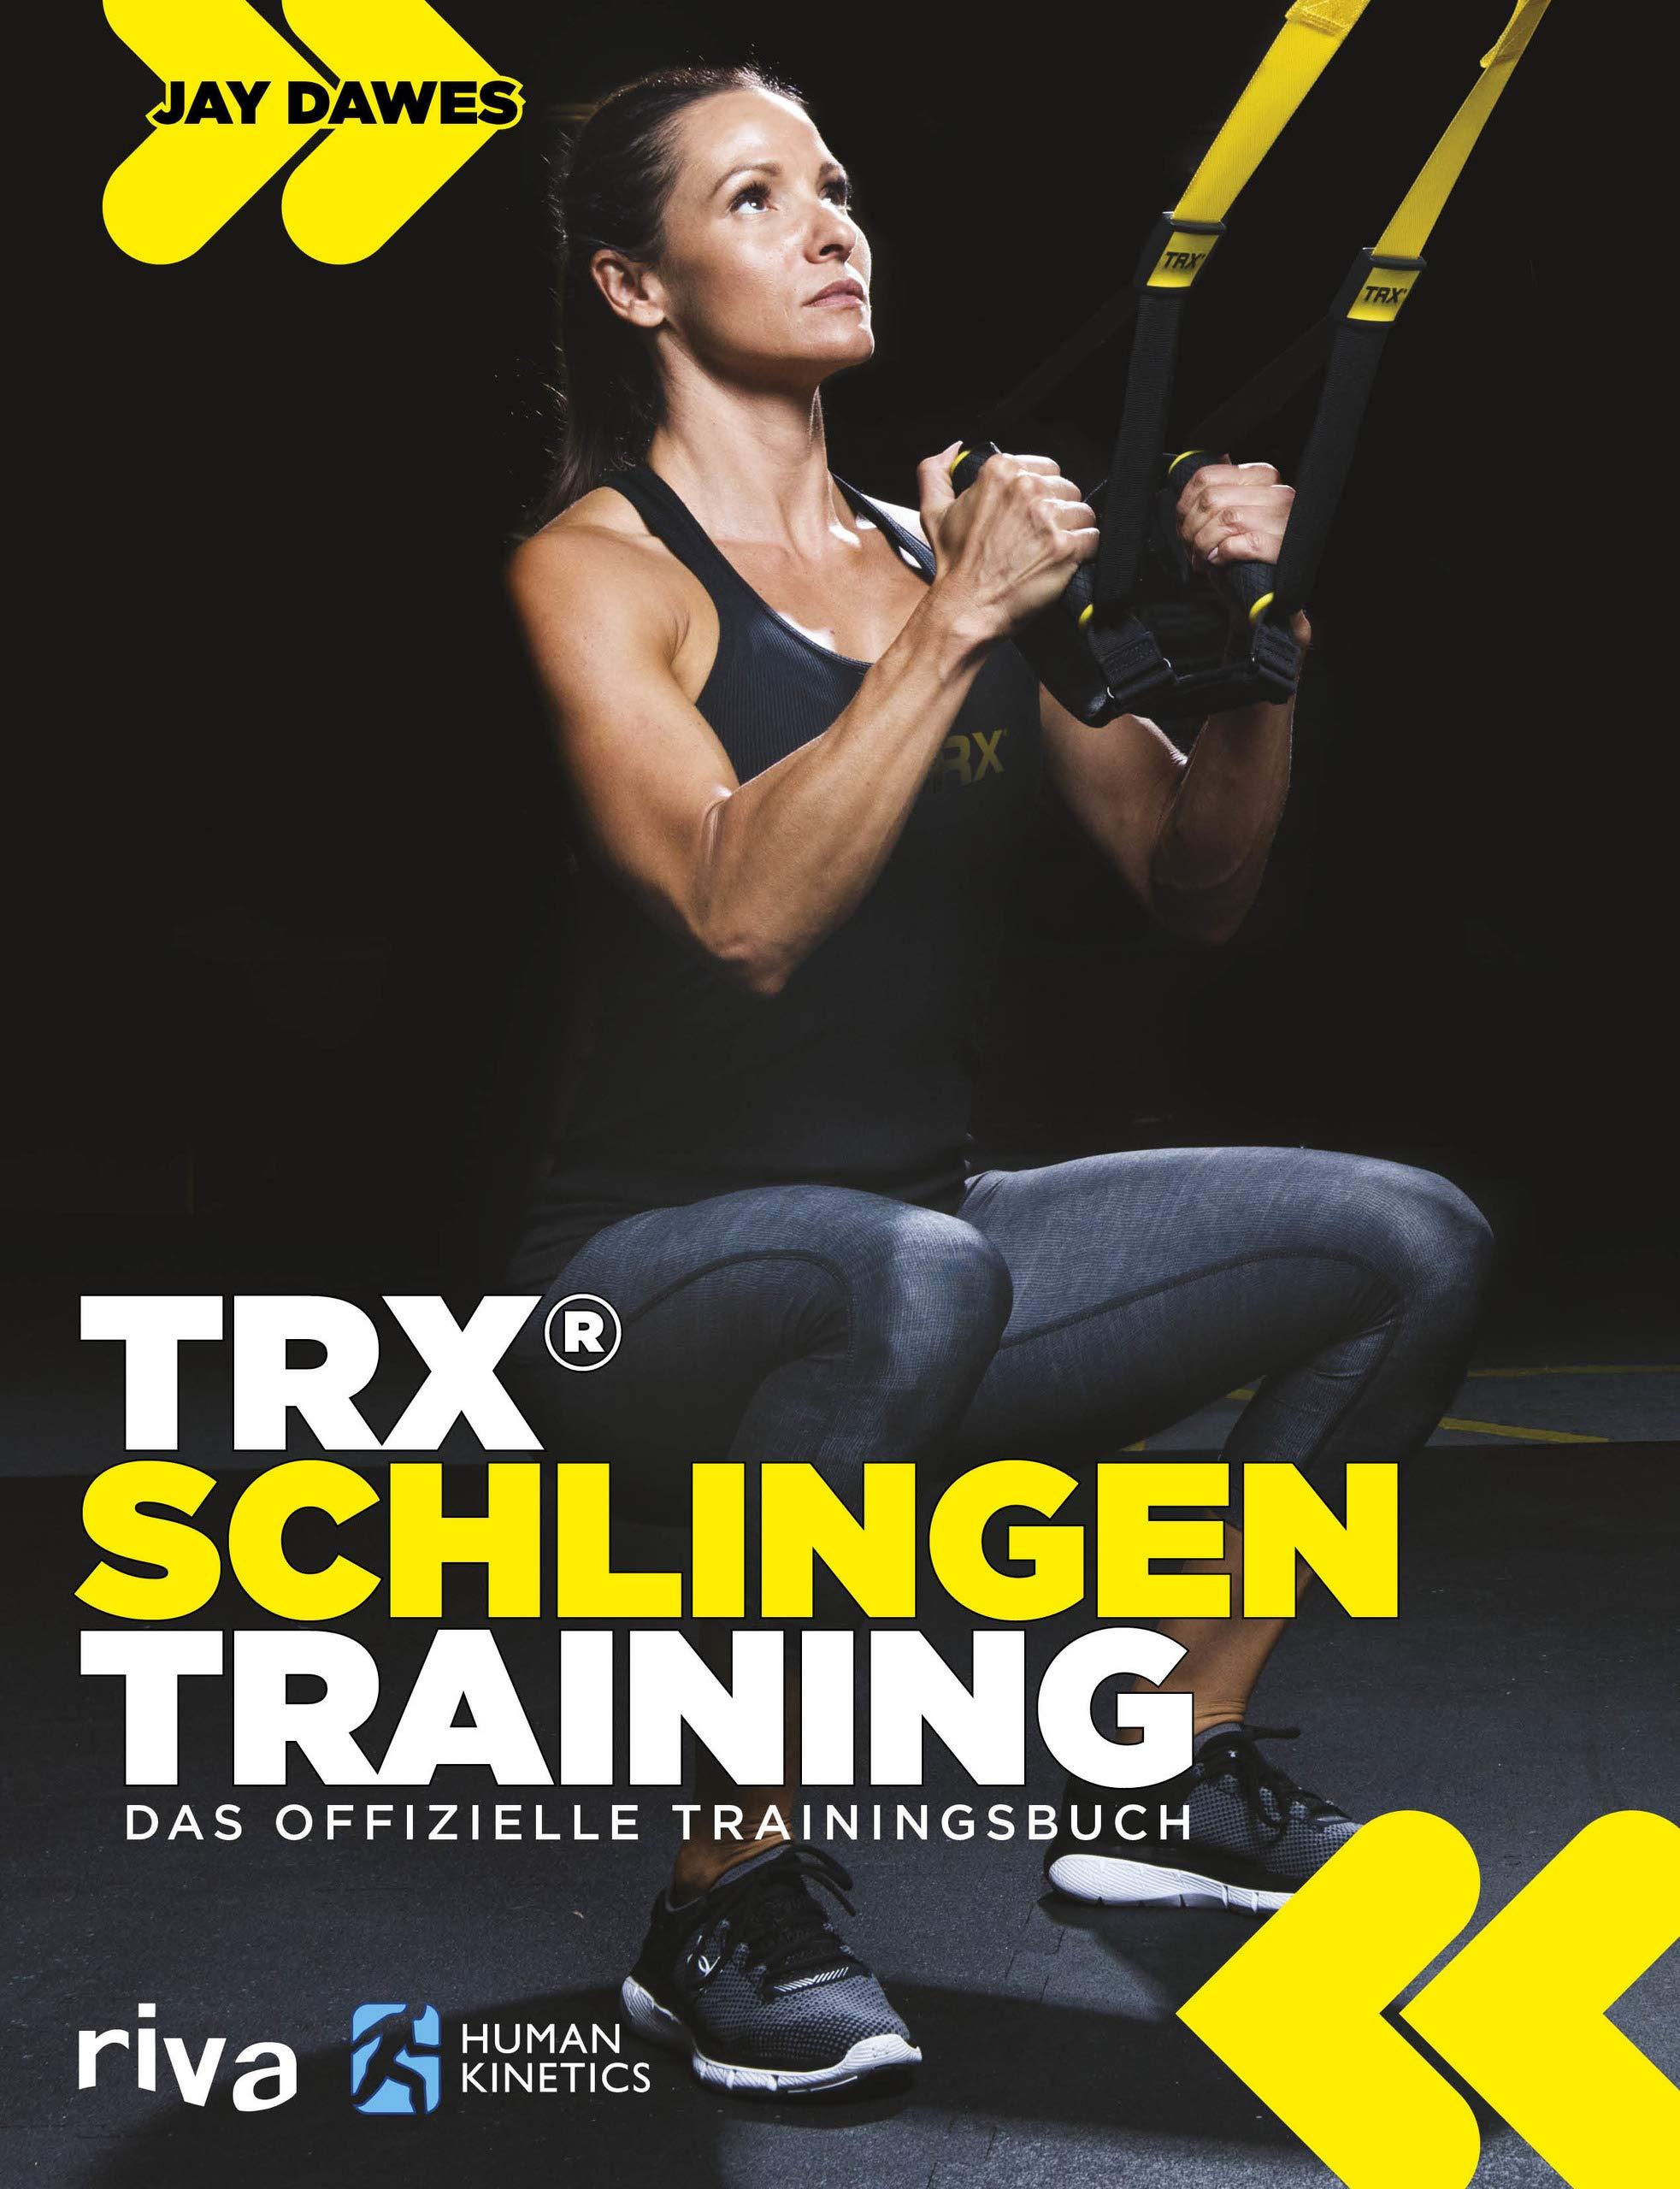 TRX®-Schlingentraining: Das offizielle Trainingsbuch: Amazon ...